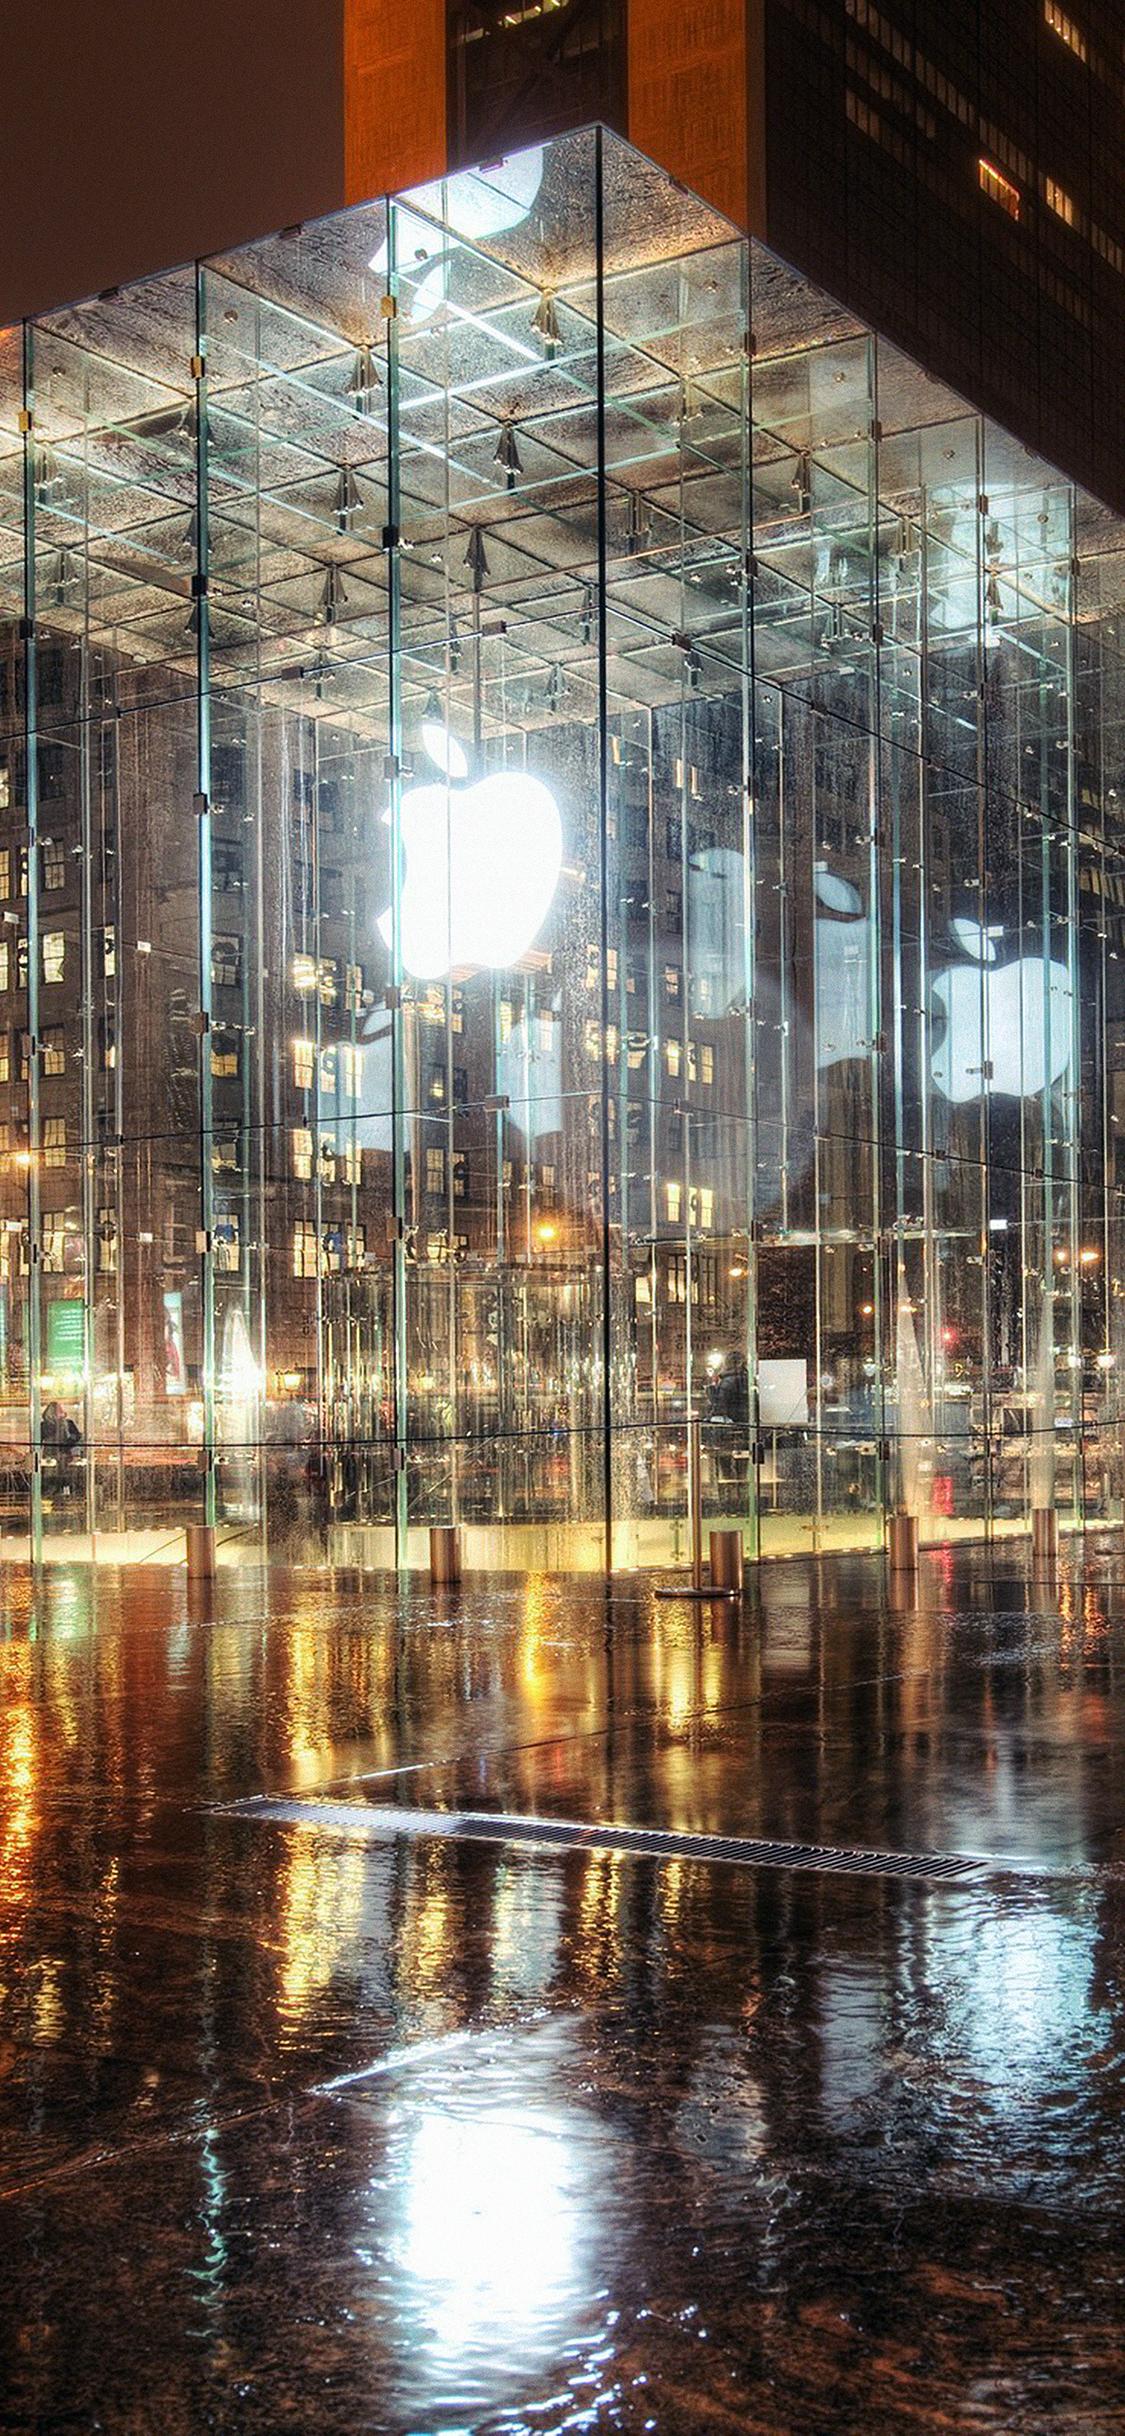 iPhoneXpapers.com-Apple-iPhone-wallpaper-mh73-raining-apple-store-newyork